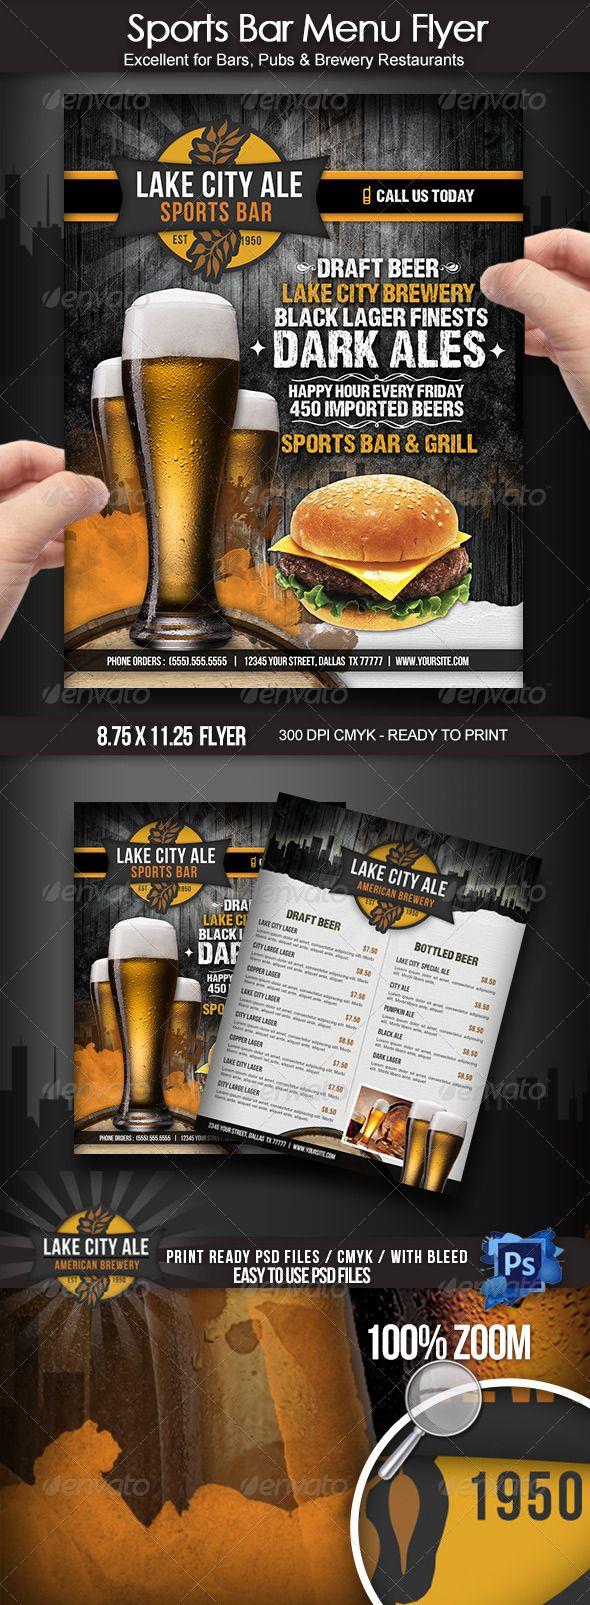 sports bar menu flyer - restaurant flyers | cranker | pinterest